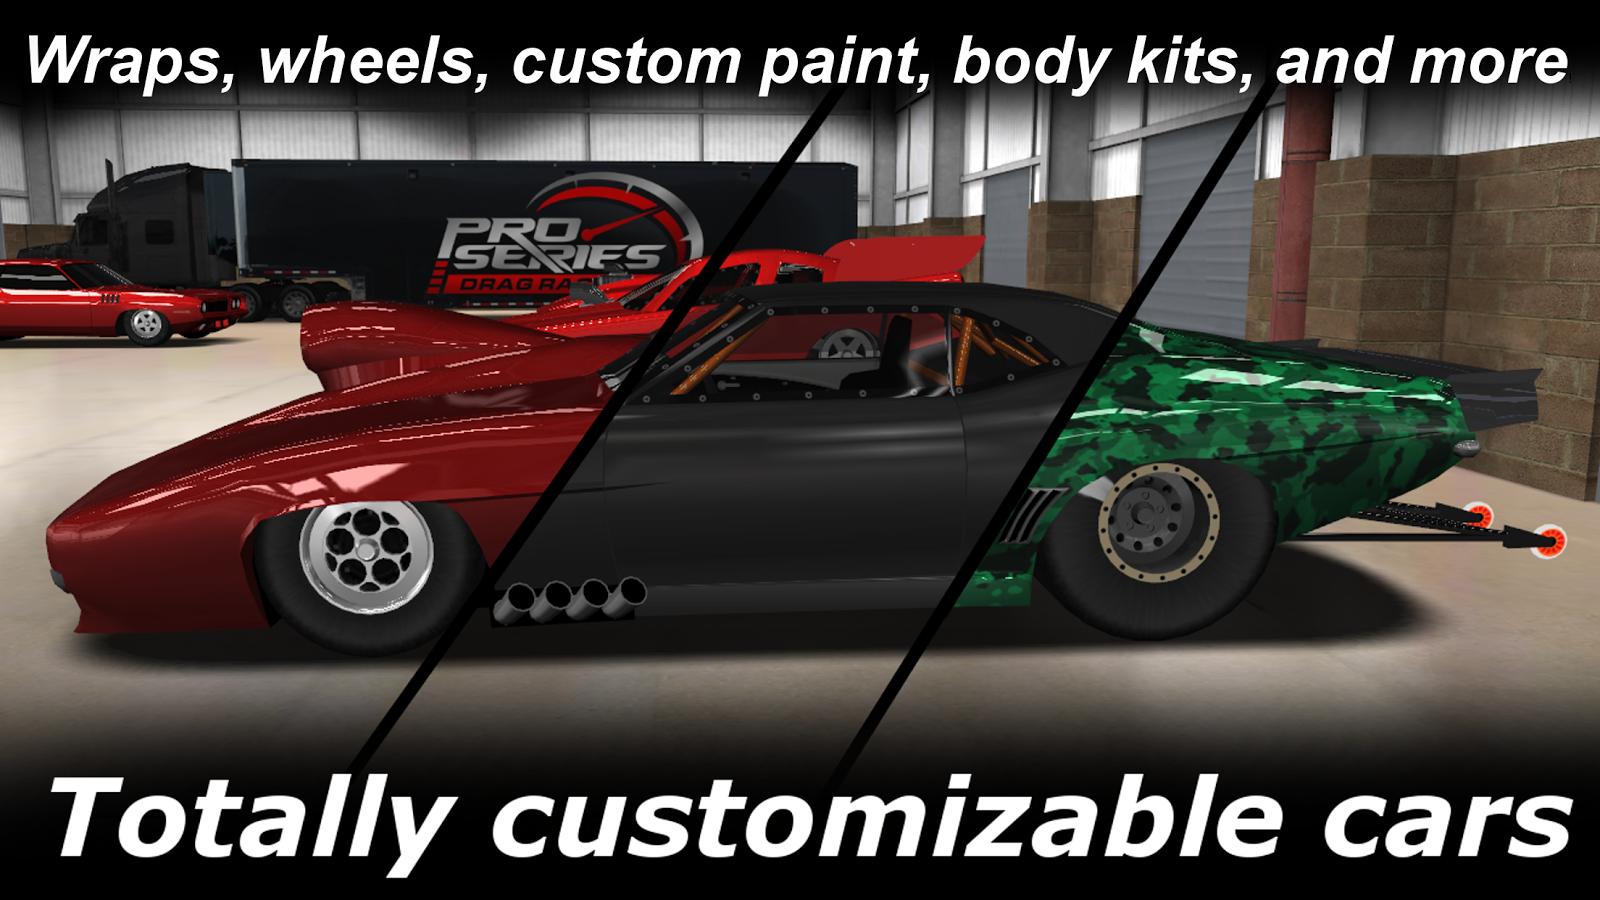 Pro Series Drag Racing 2 20 APK Download - Android Racing Games